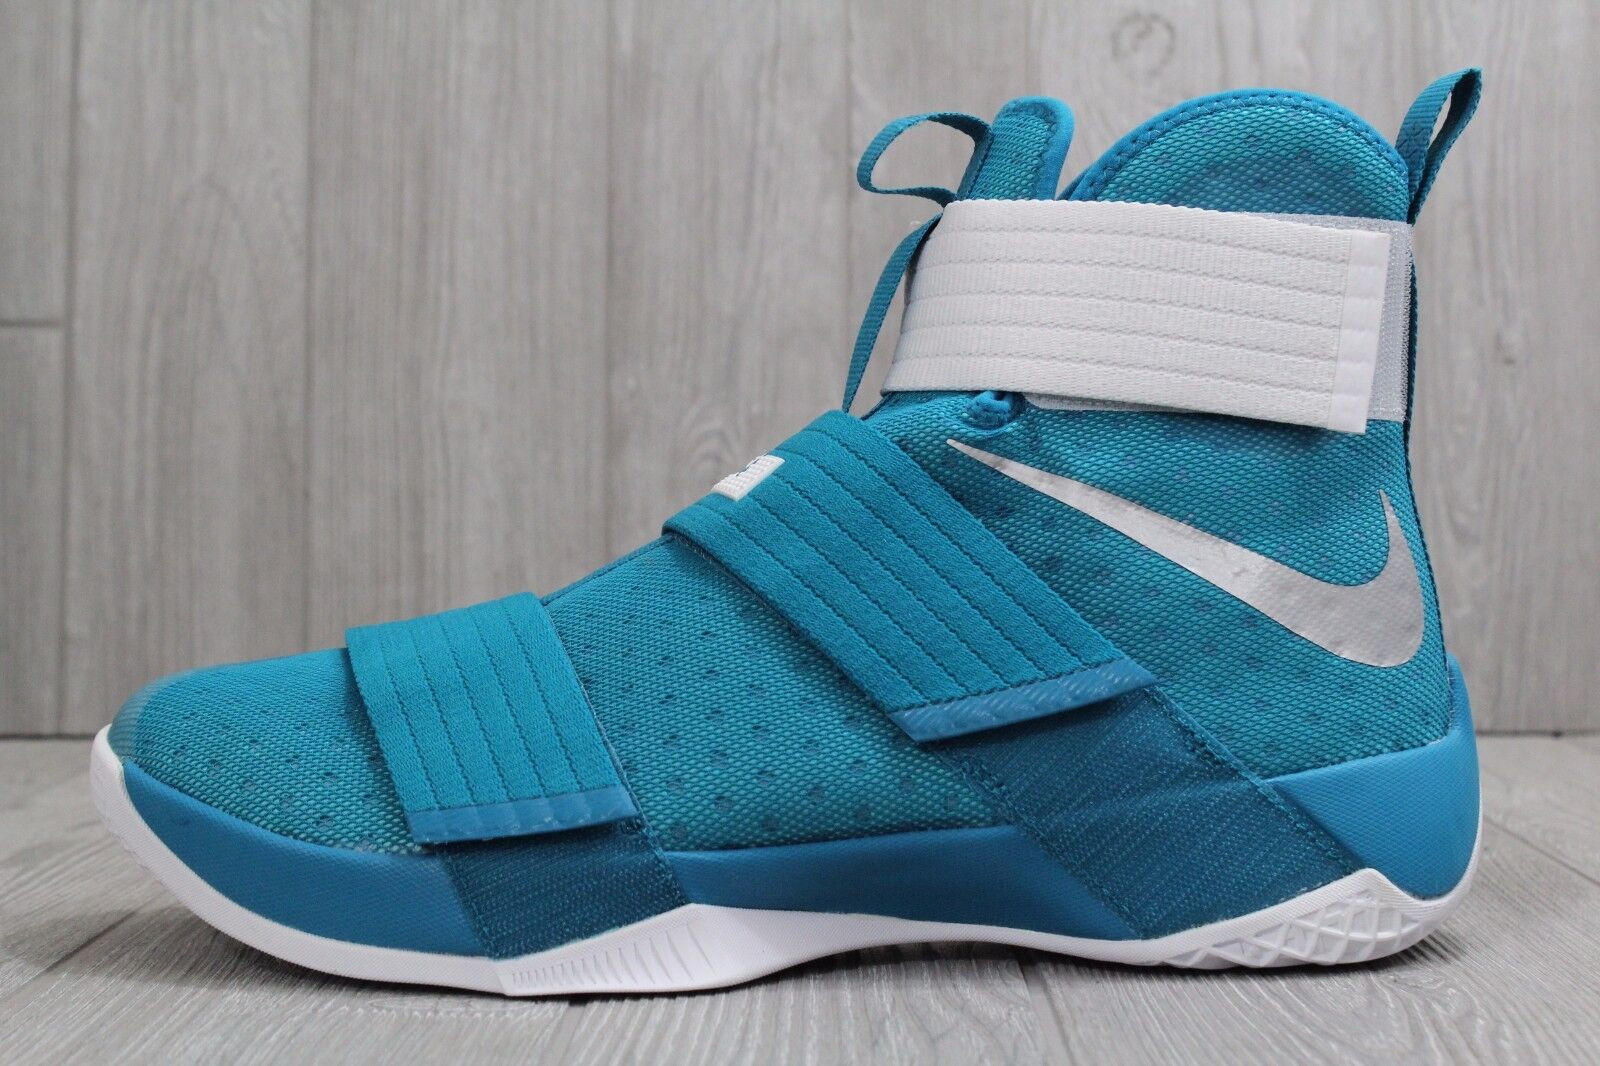 22 New Mens Nike Lebron Soldier X 10 Teal 856489 12.5, 15 Basketball Shoes Seasonal clearance sale